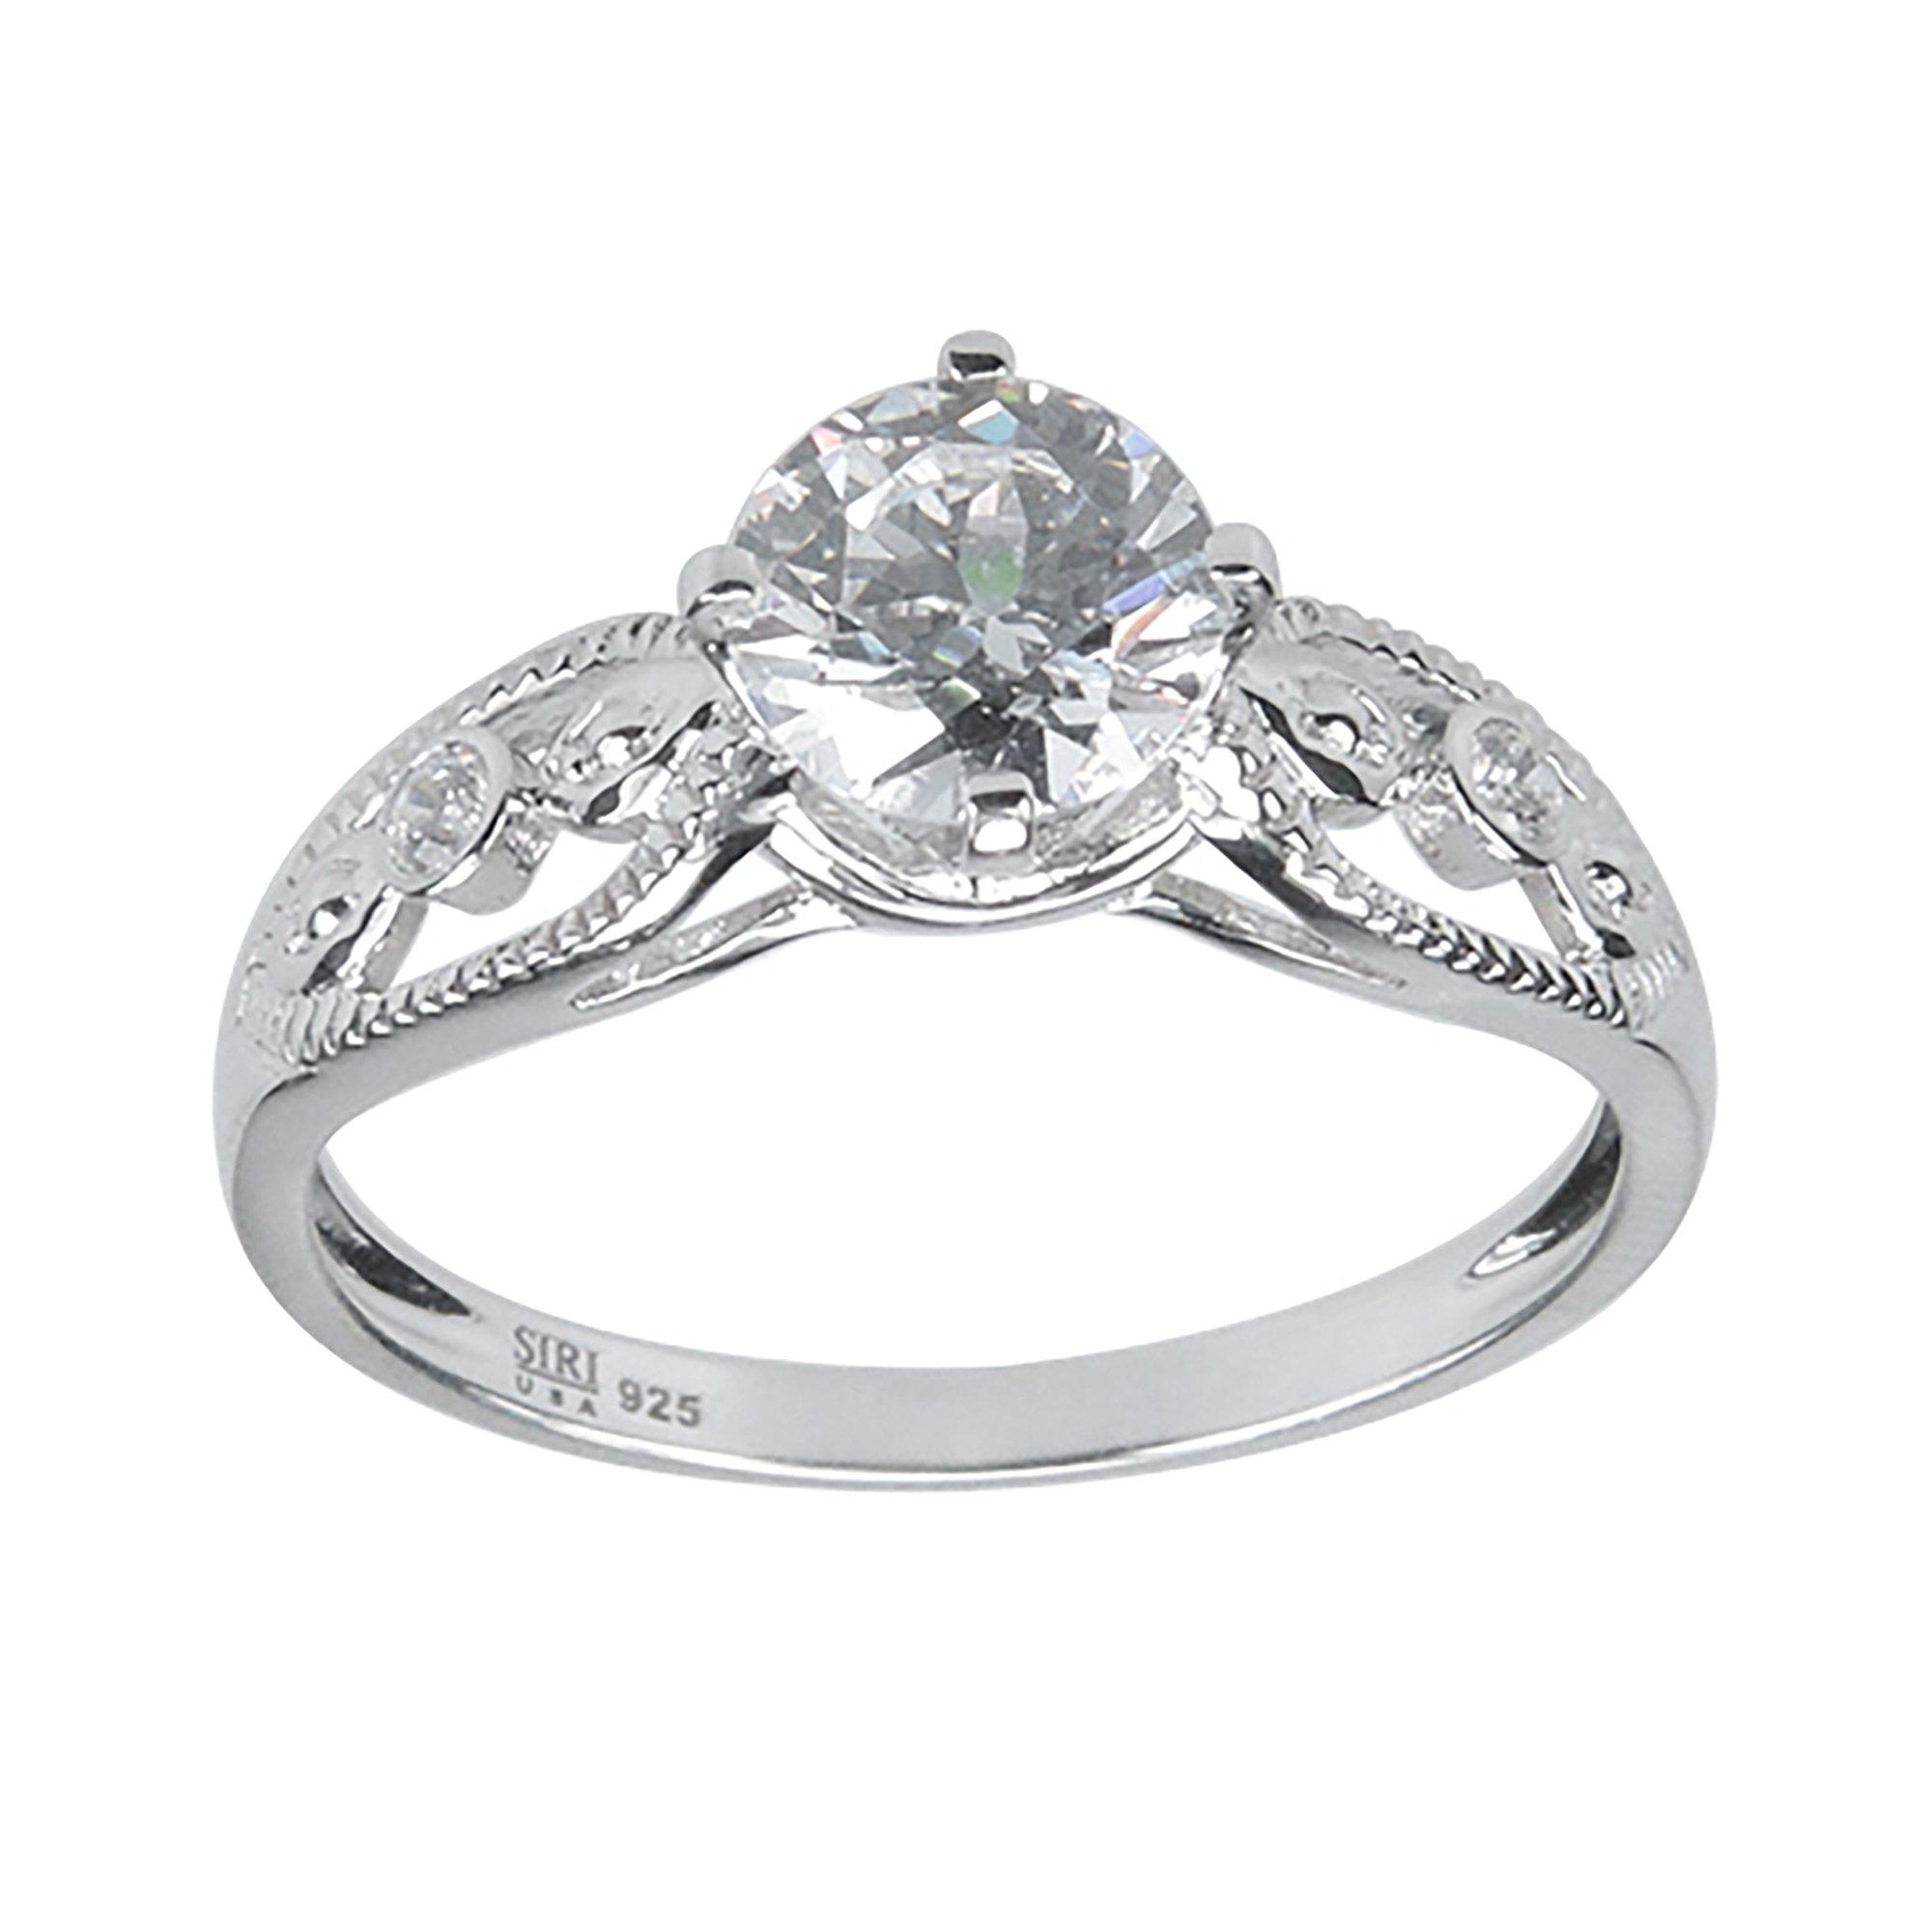 Aura by TJM Sterling Silver 1.40 cts White CZ Bridal Wedding Ring